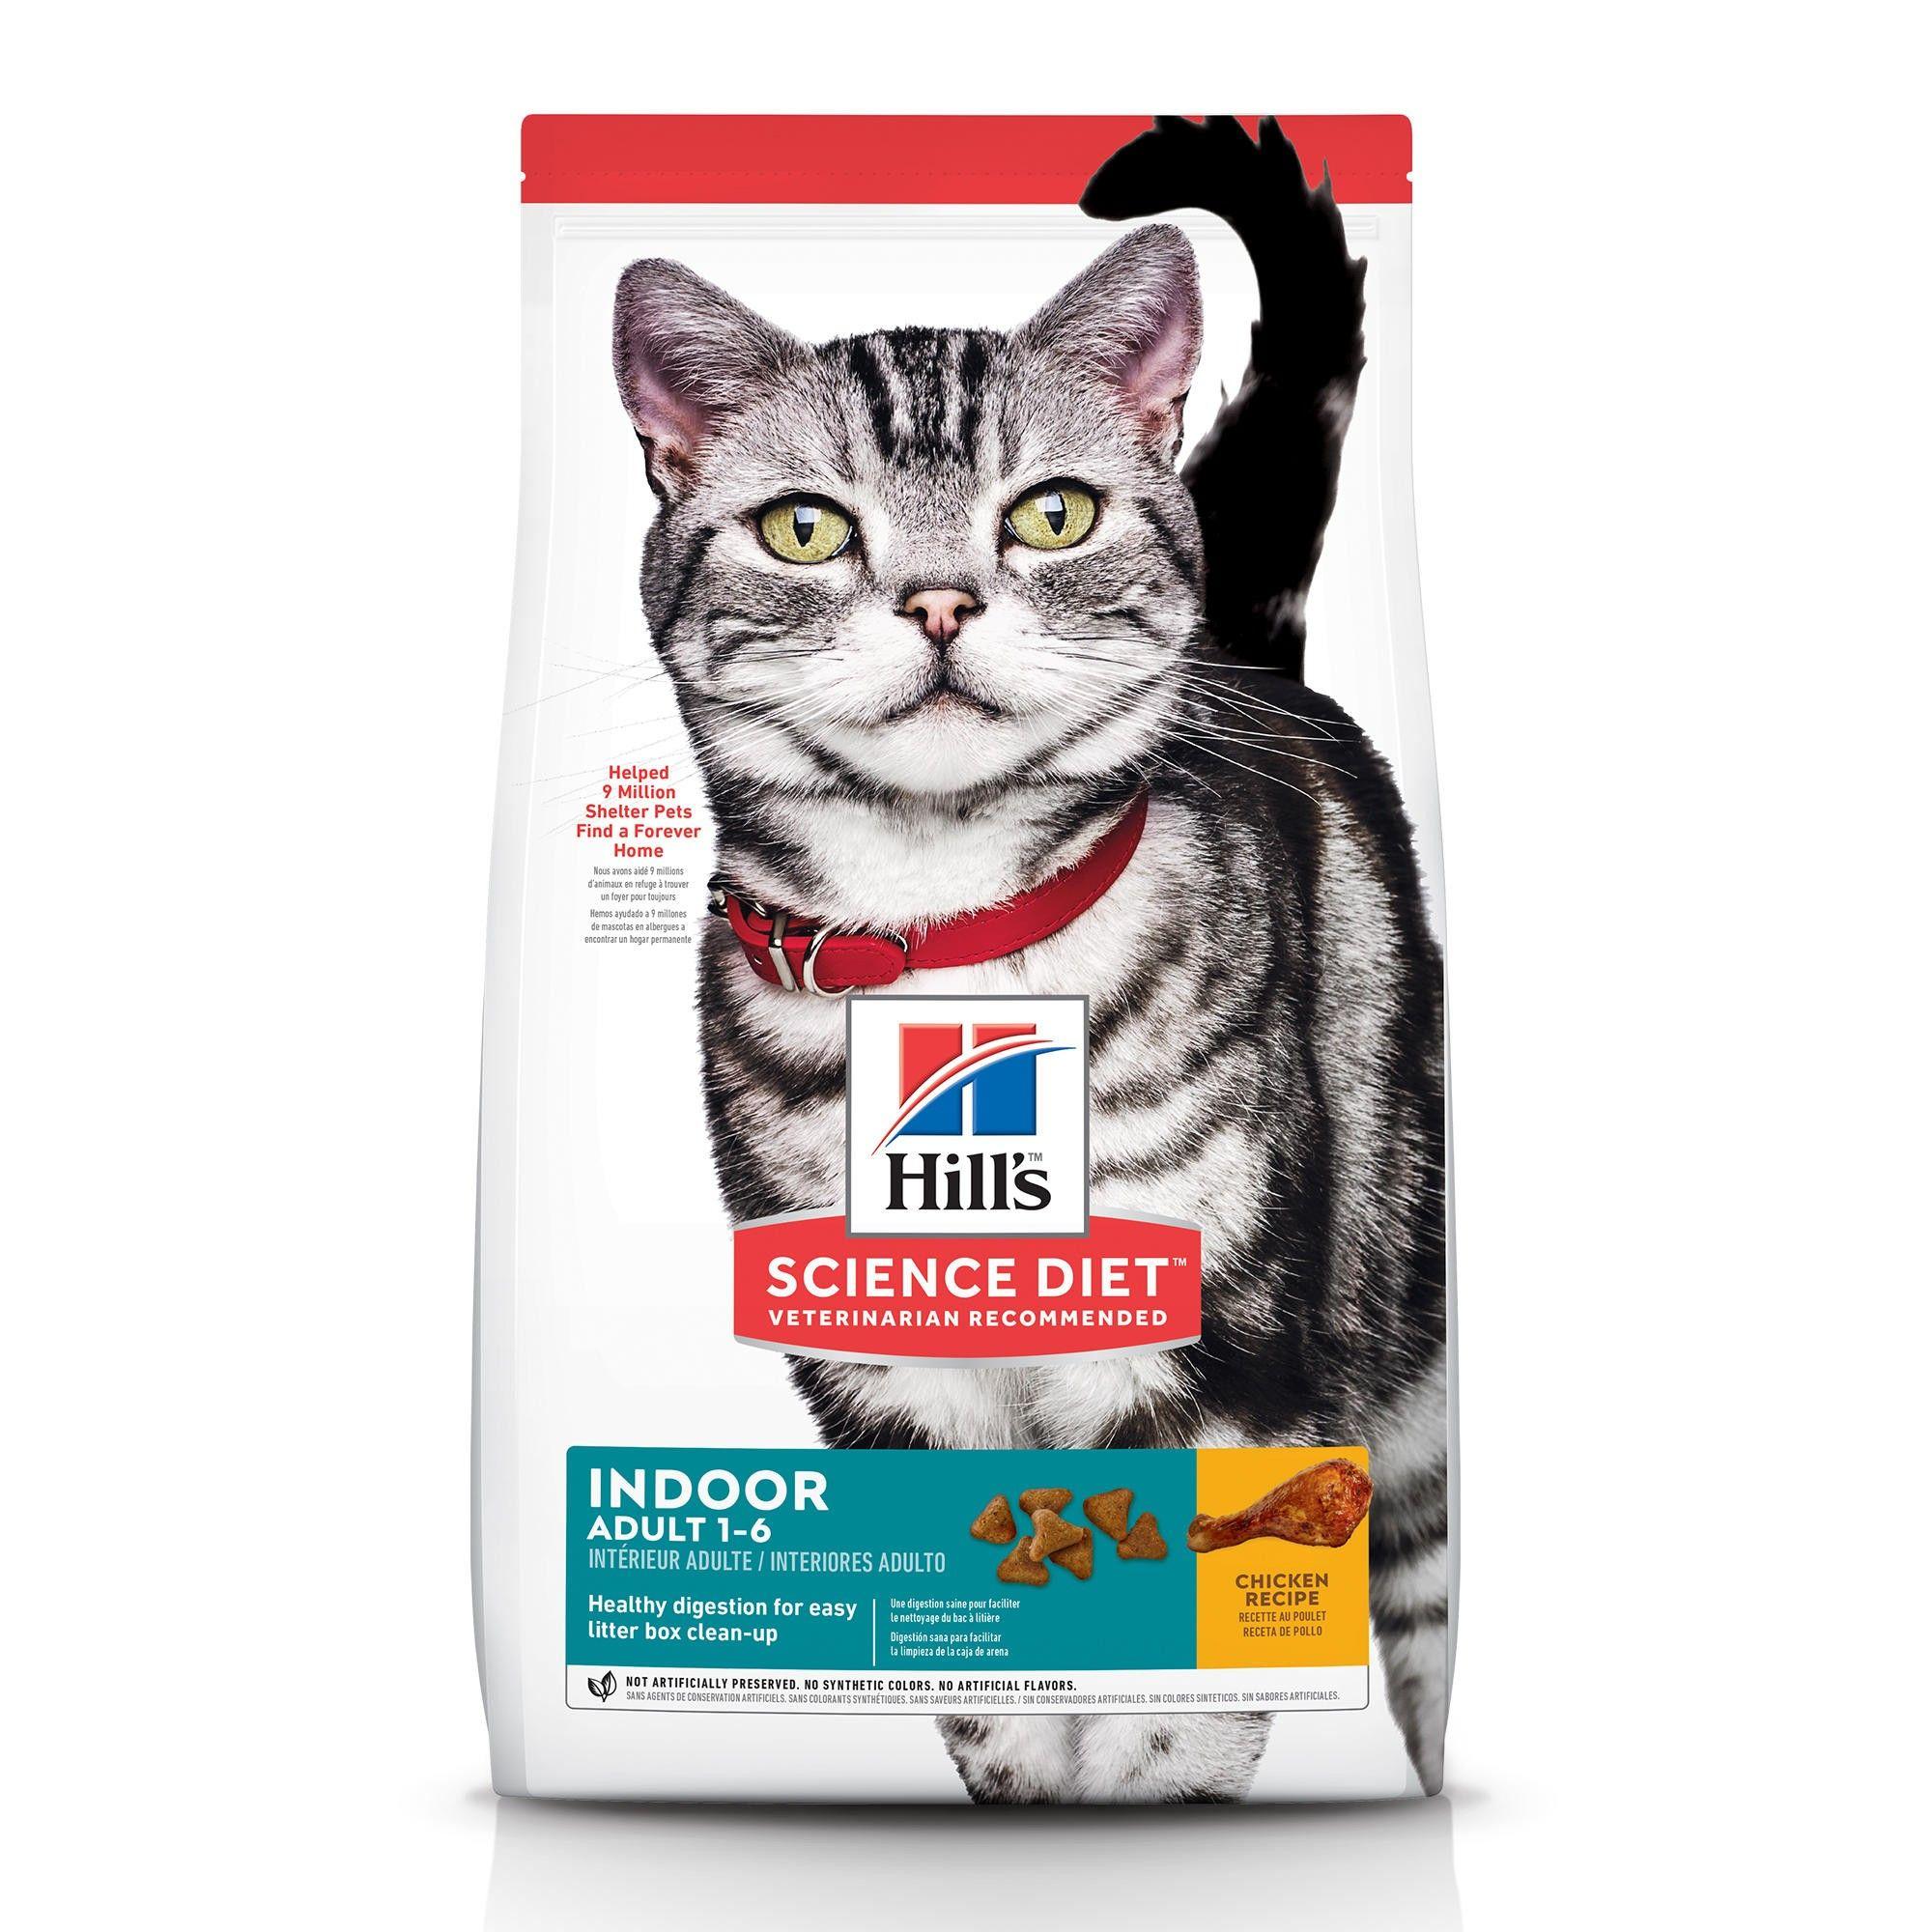 Hill's Science Diet Adult Indoor Cat Dry Cat Food Image